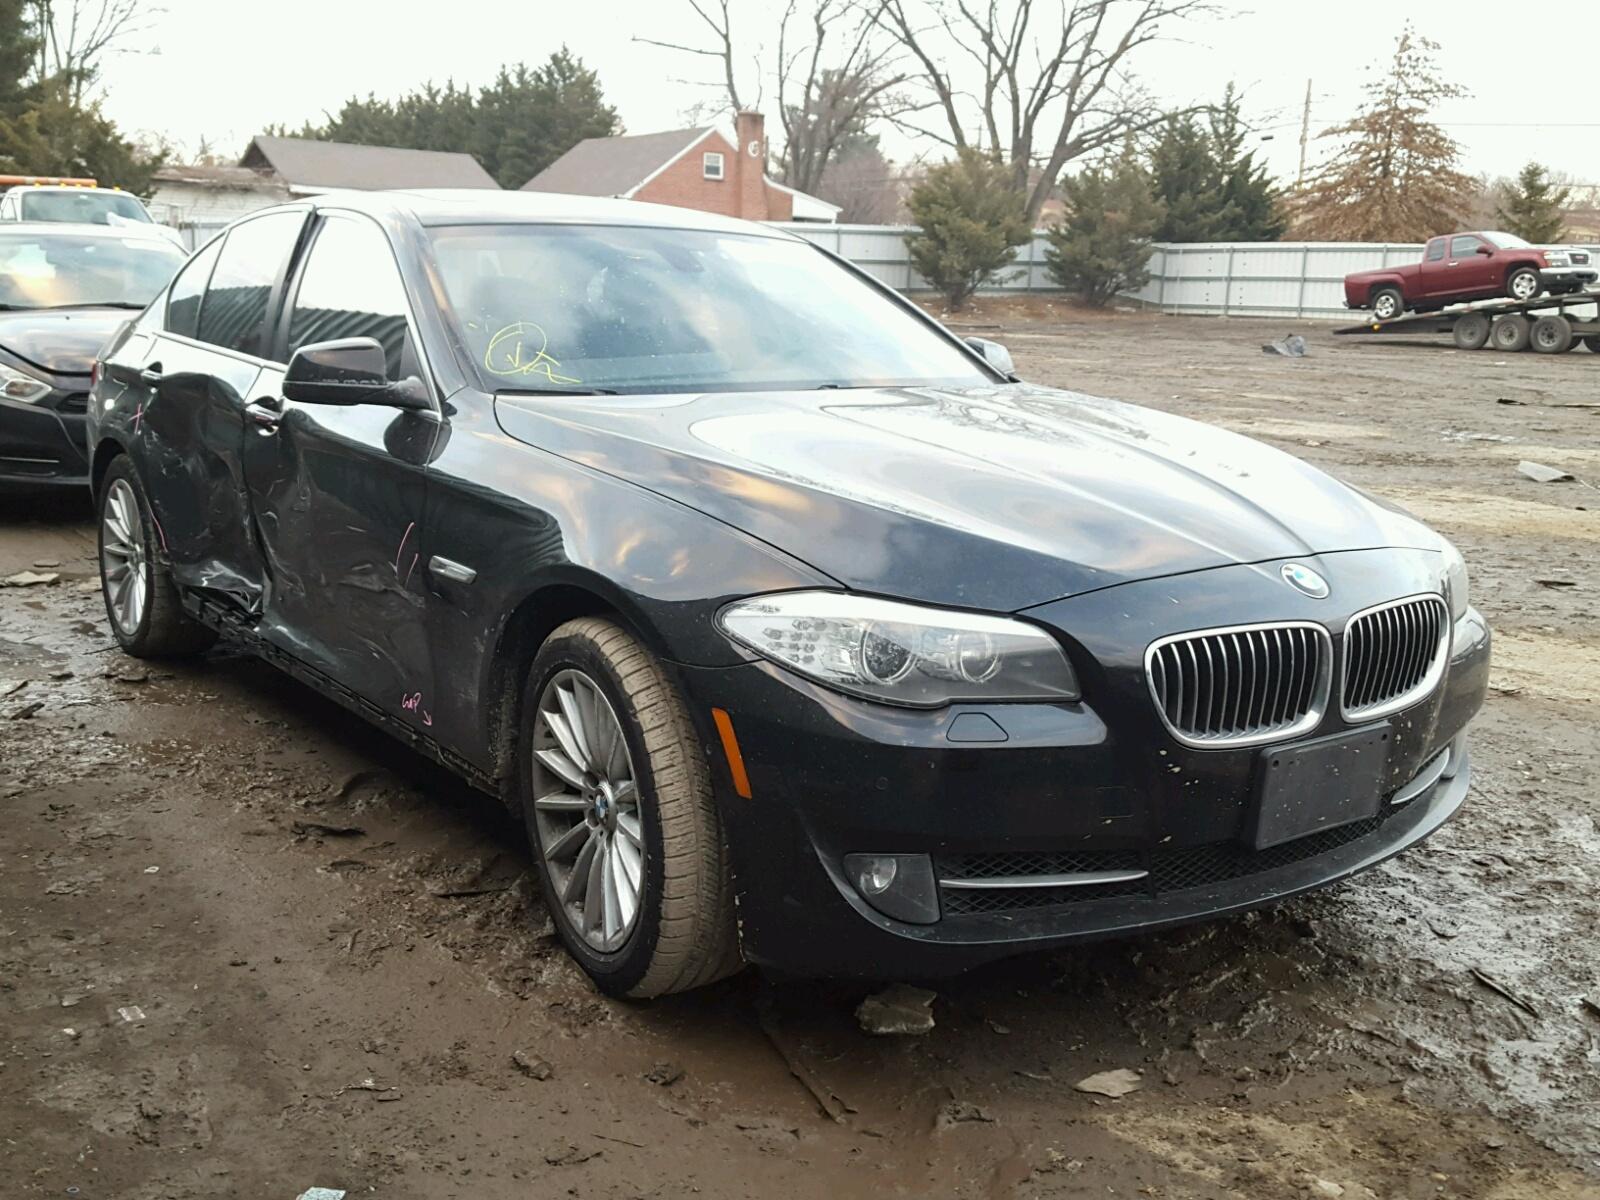 Salvaged Automobiles in Finksburg, MD for Auction - AutoBidMaster